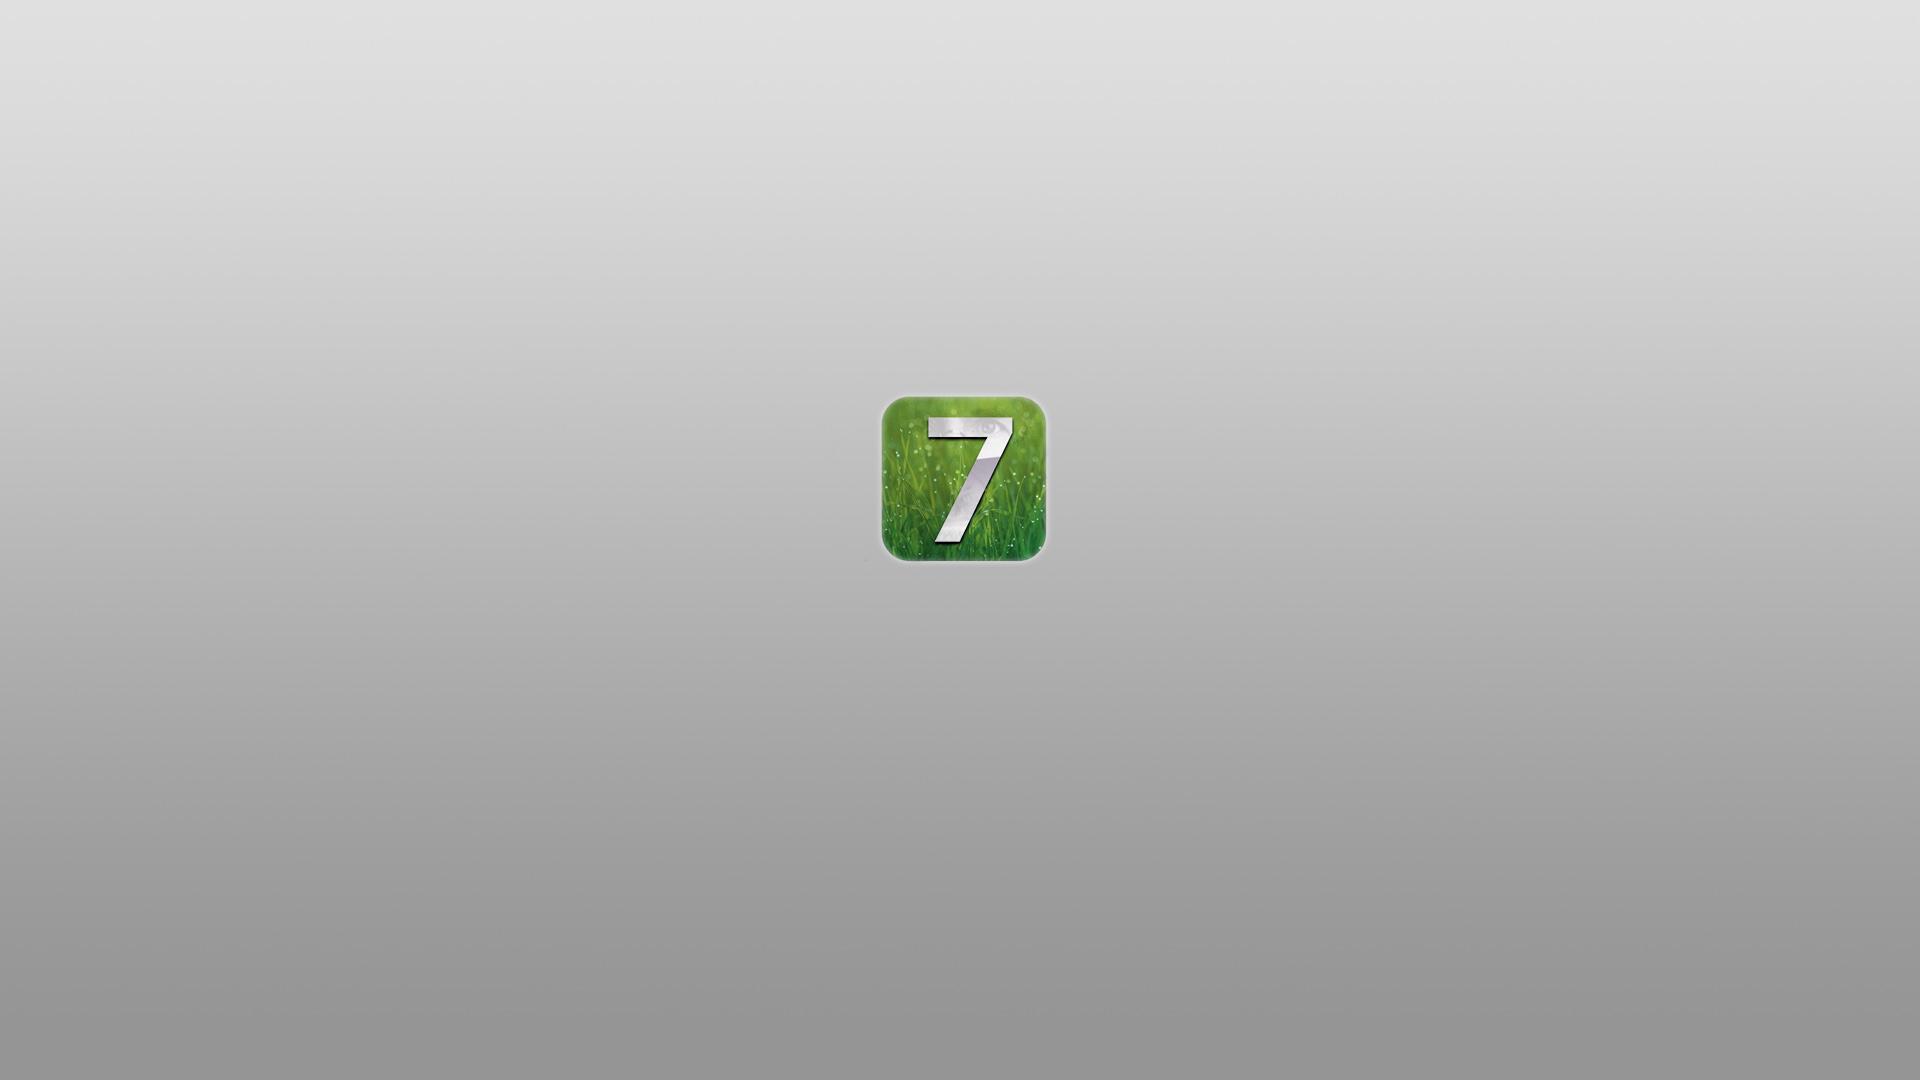 iOS 7 Wallpaper HD 1920x1080 ImageBankbiz 1920x1080